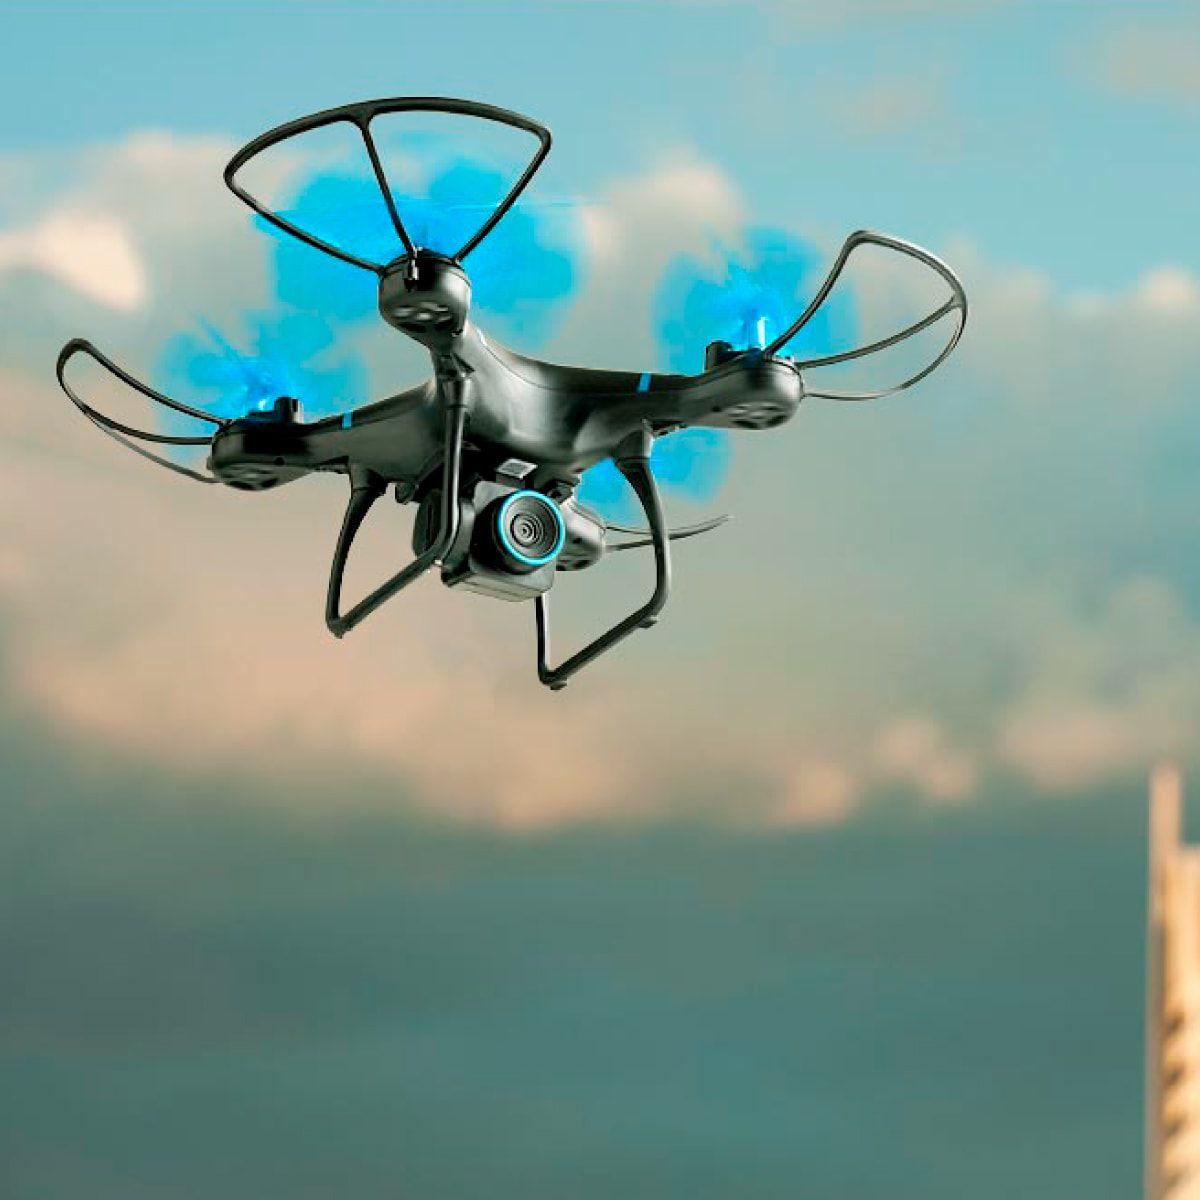 Drone Atrio Bird HD Alcance 80 metros Autonomia 22 minutos